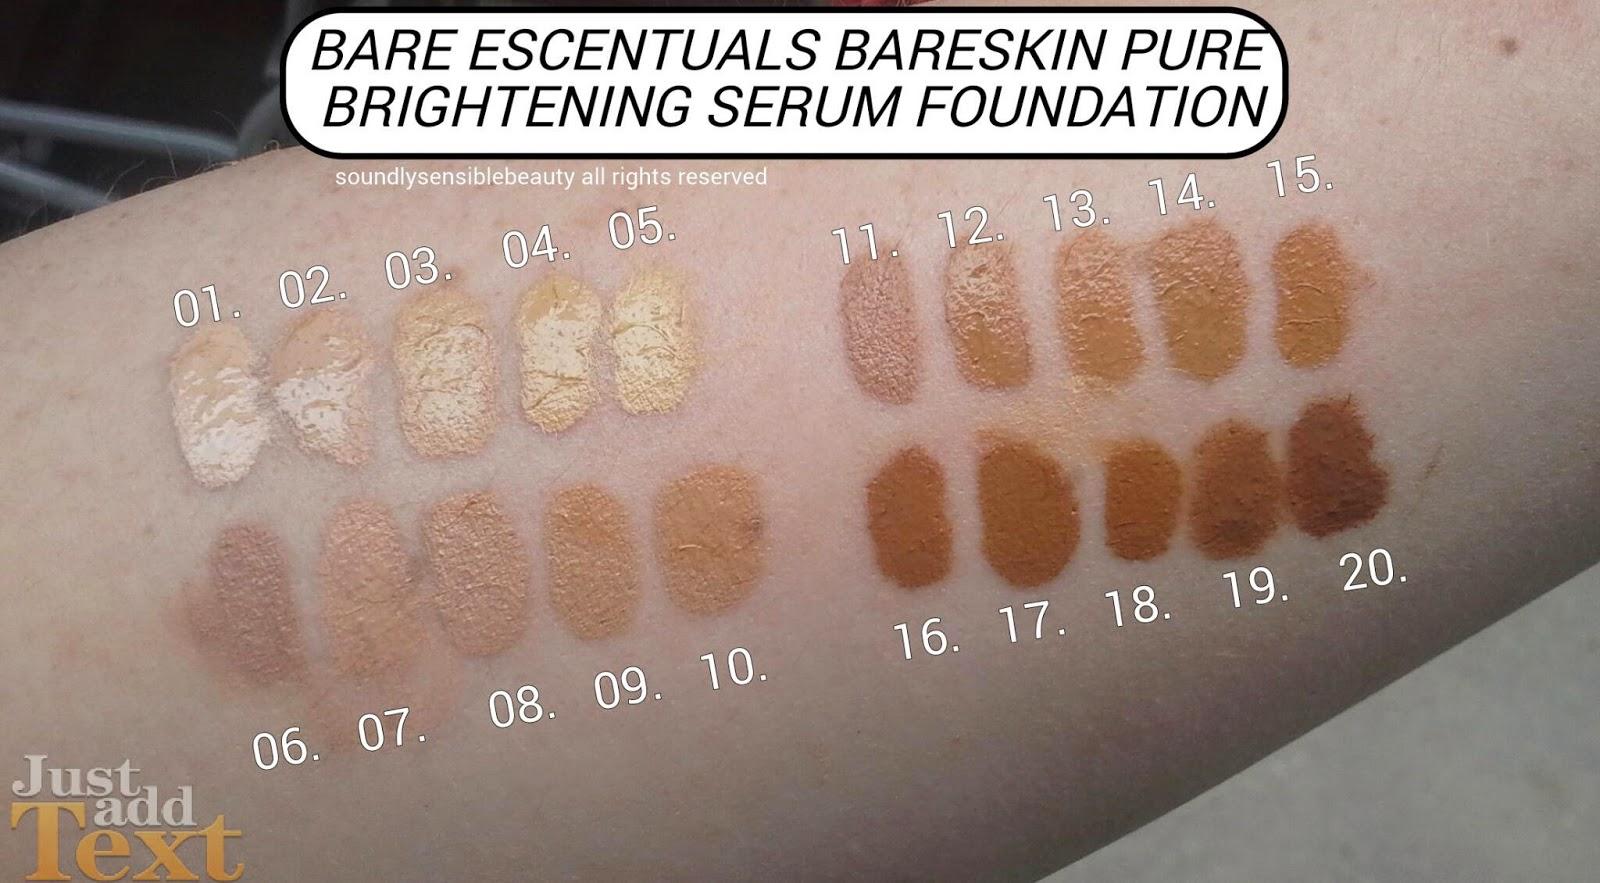 bareskin pure brightening serum foundation